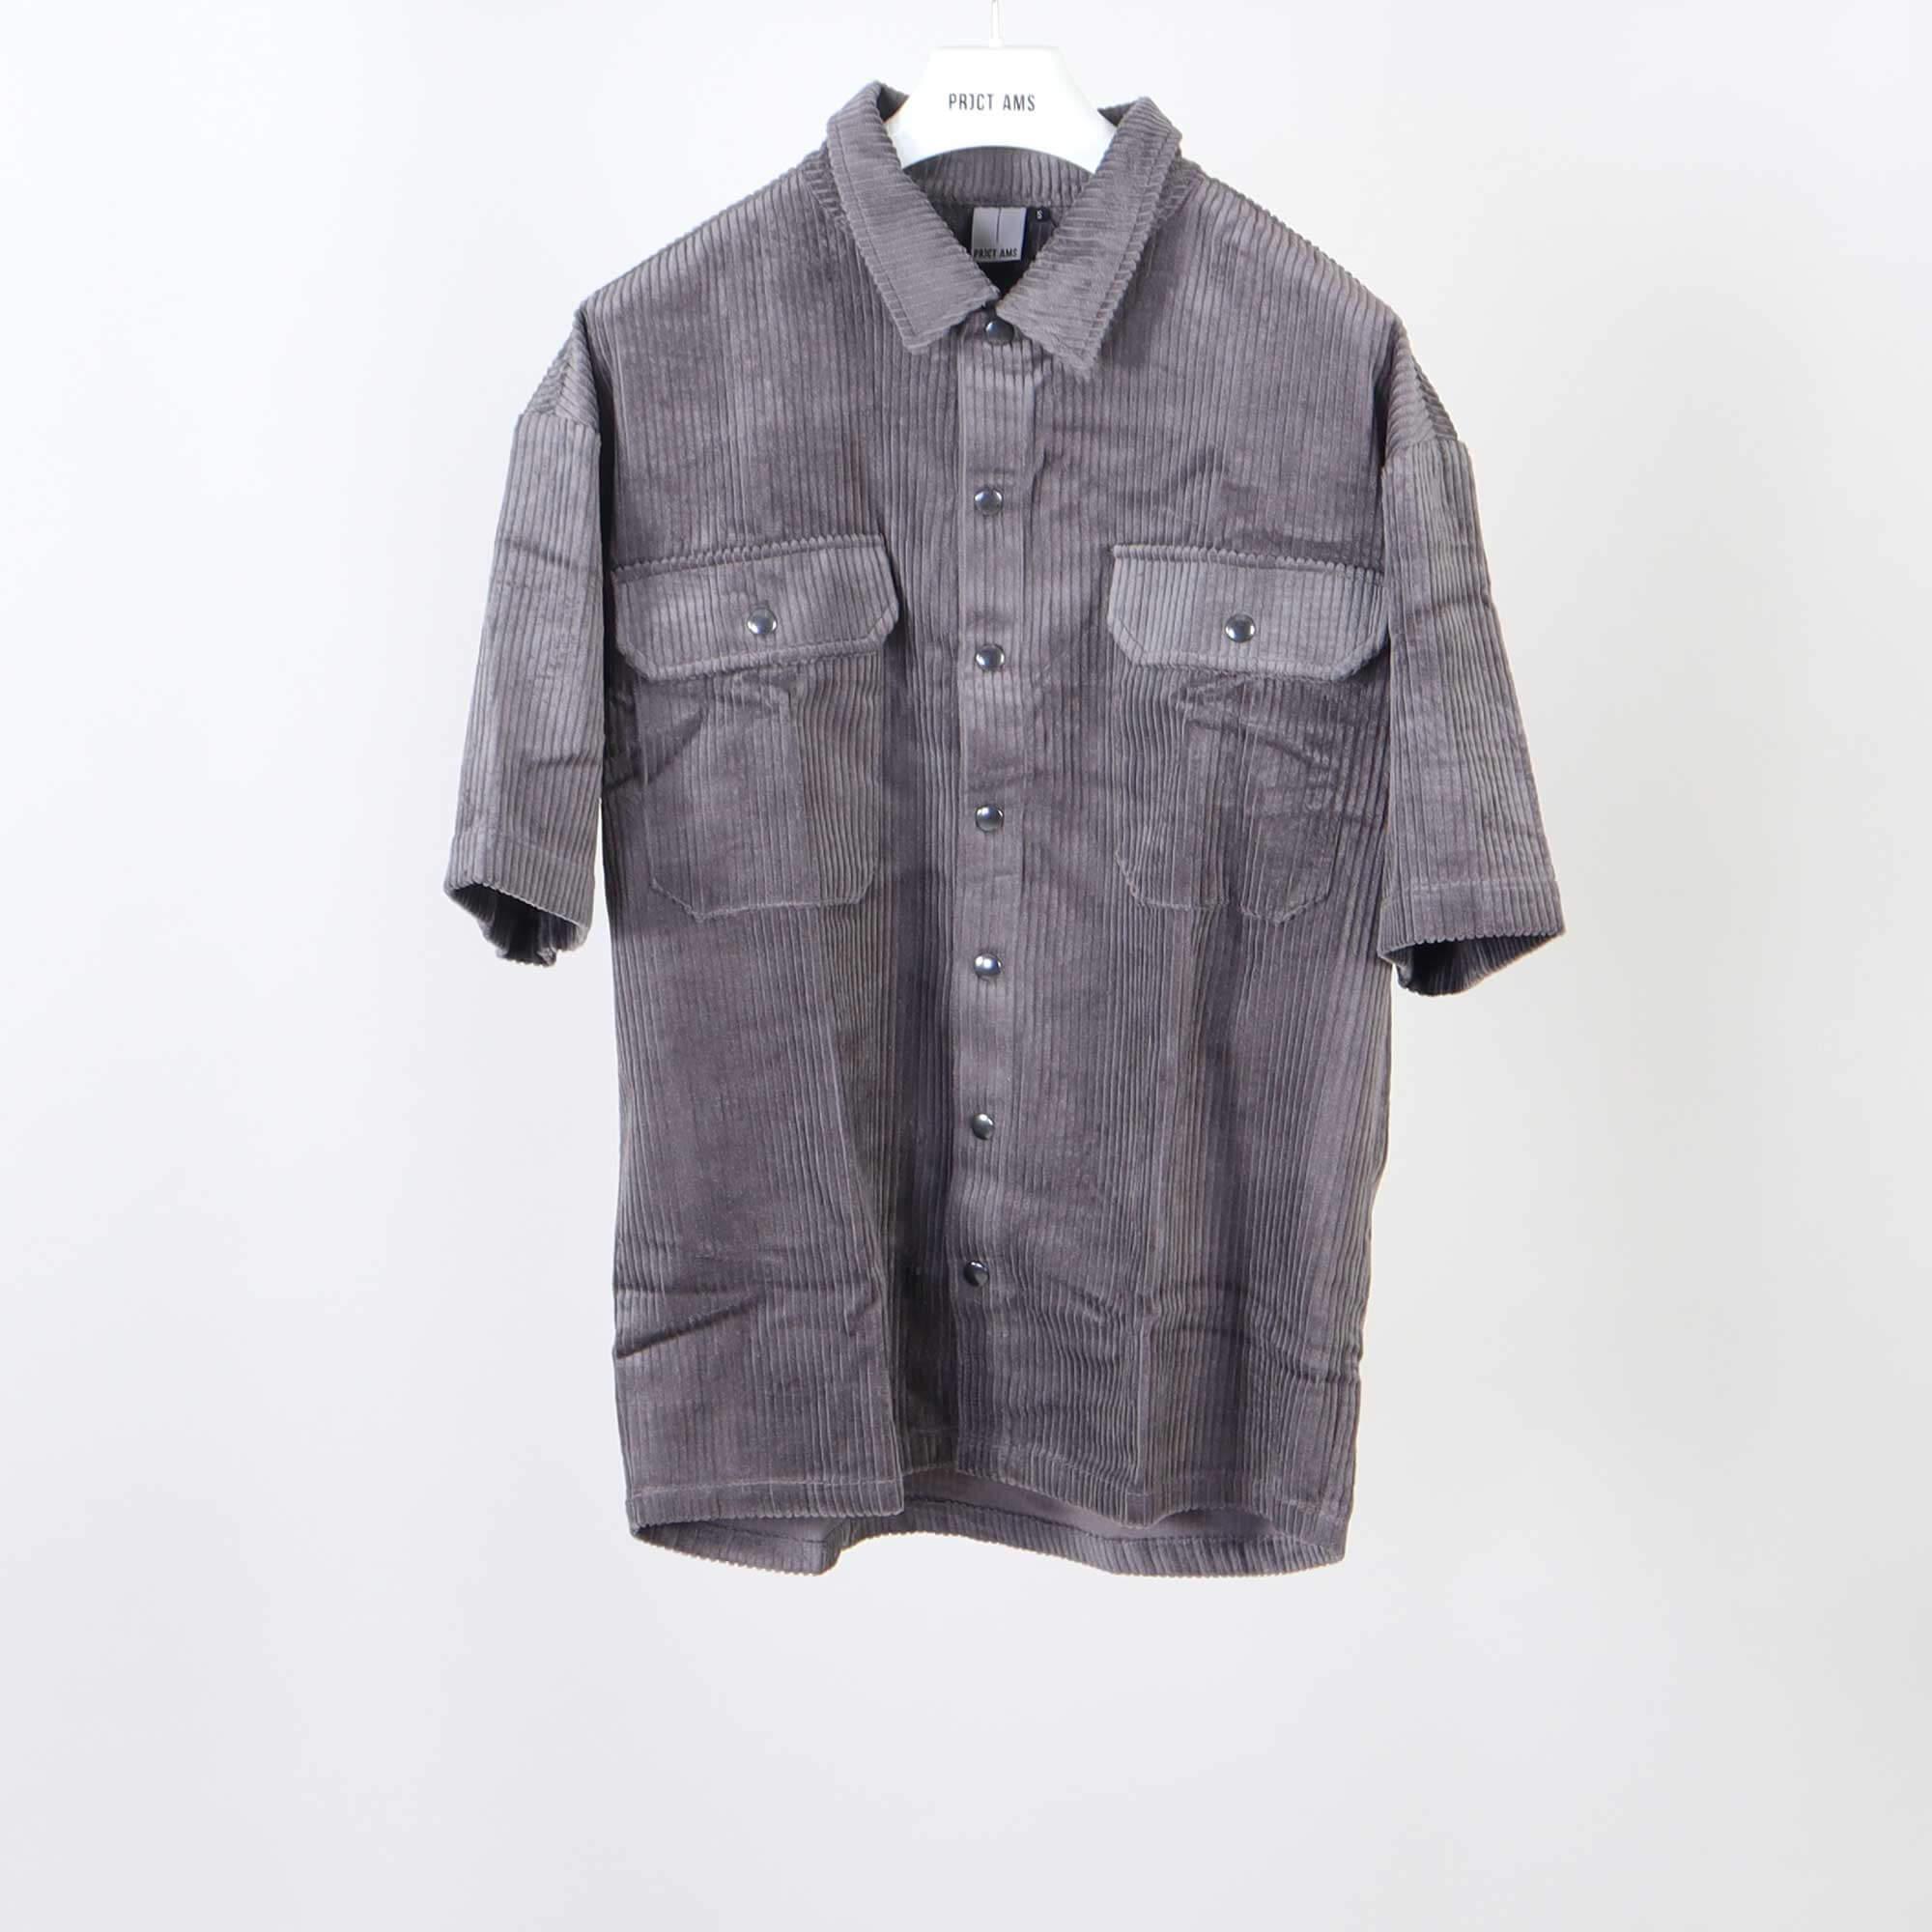 shortsleeve-grijs-1